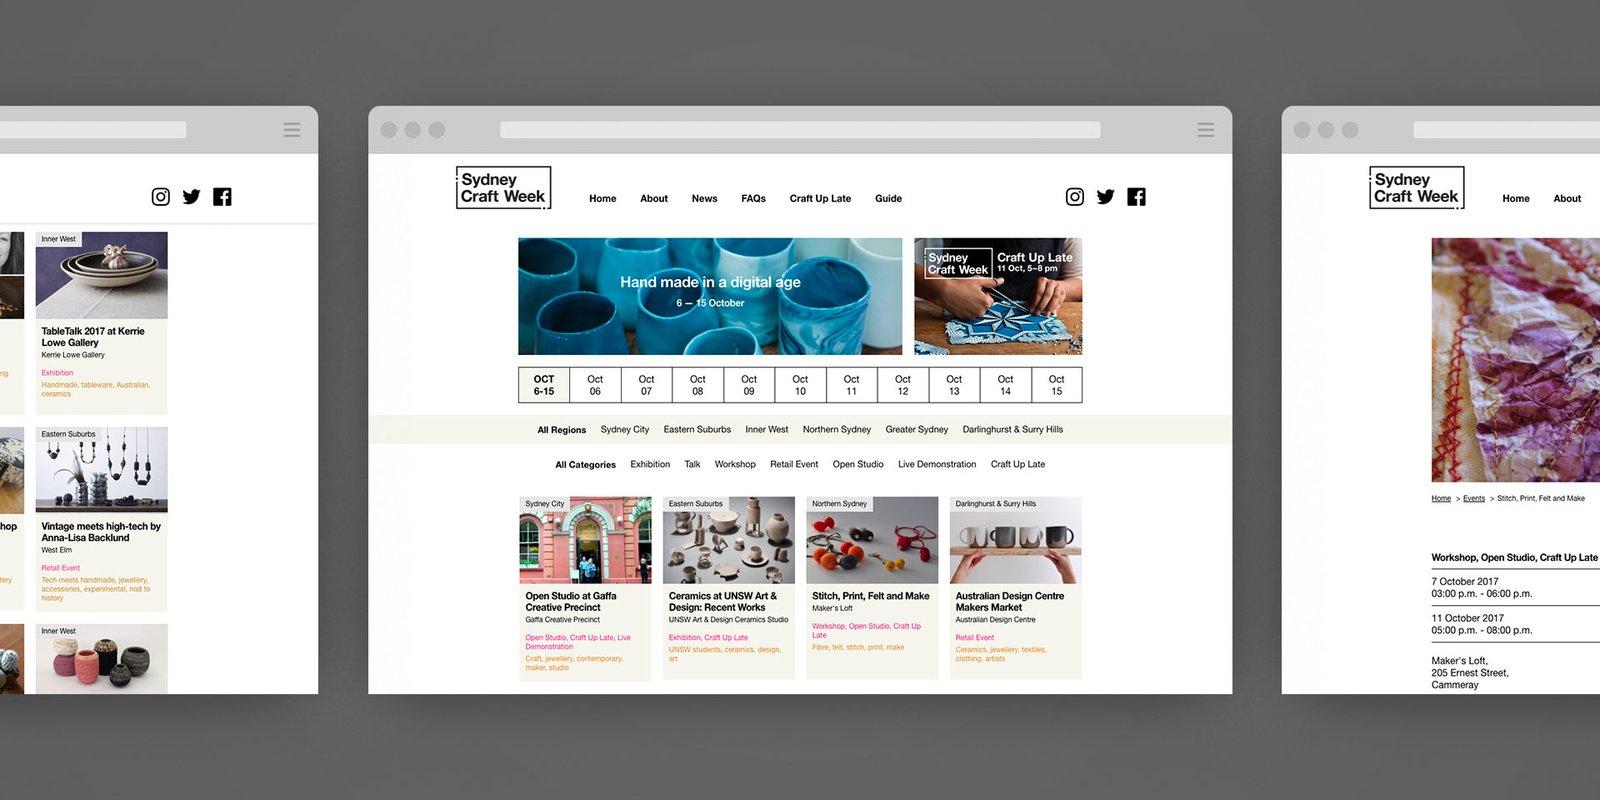 Screenshots of Sydney Craft Week website